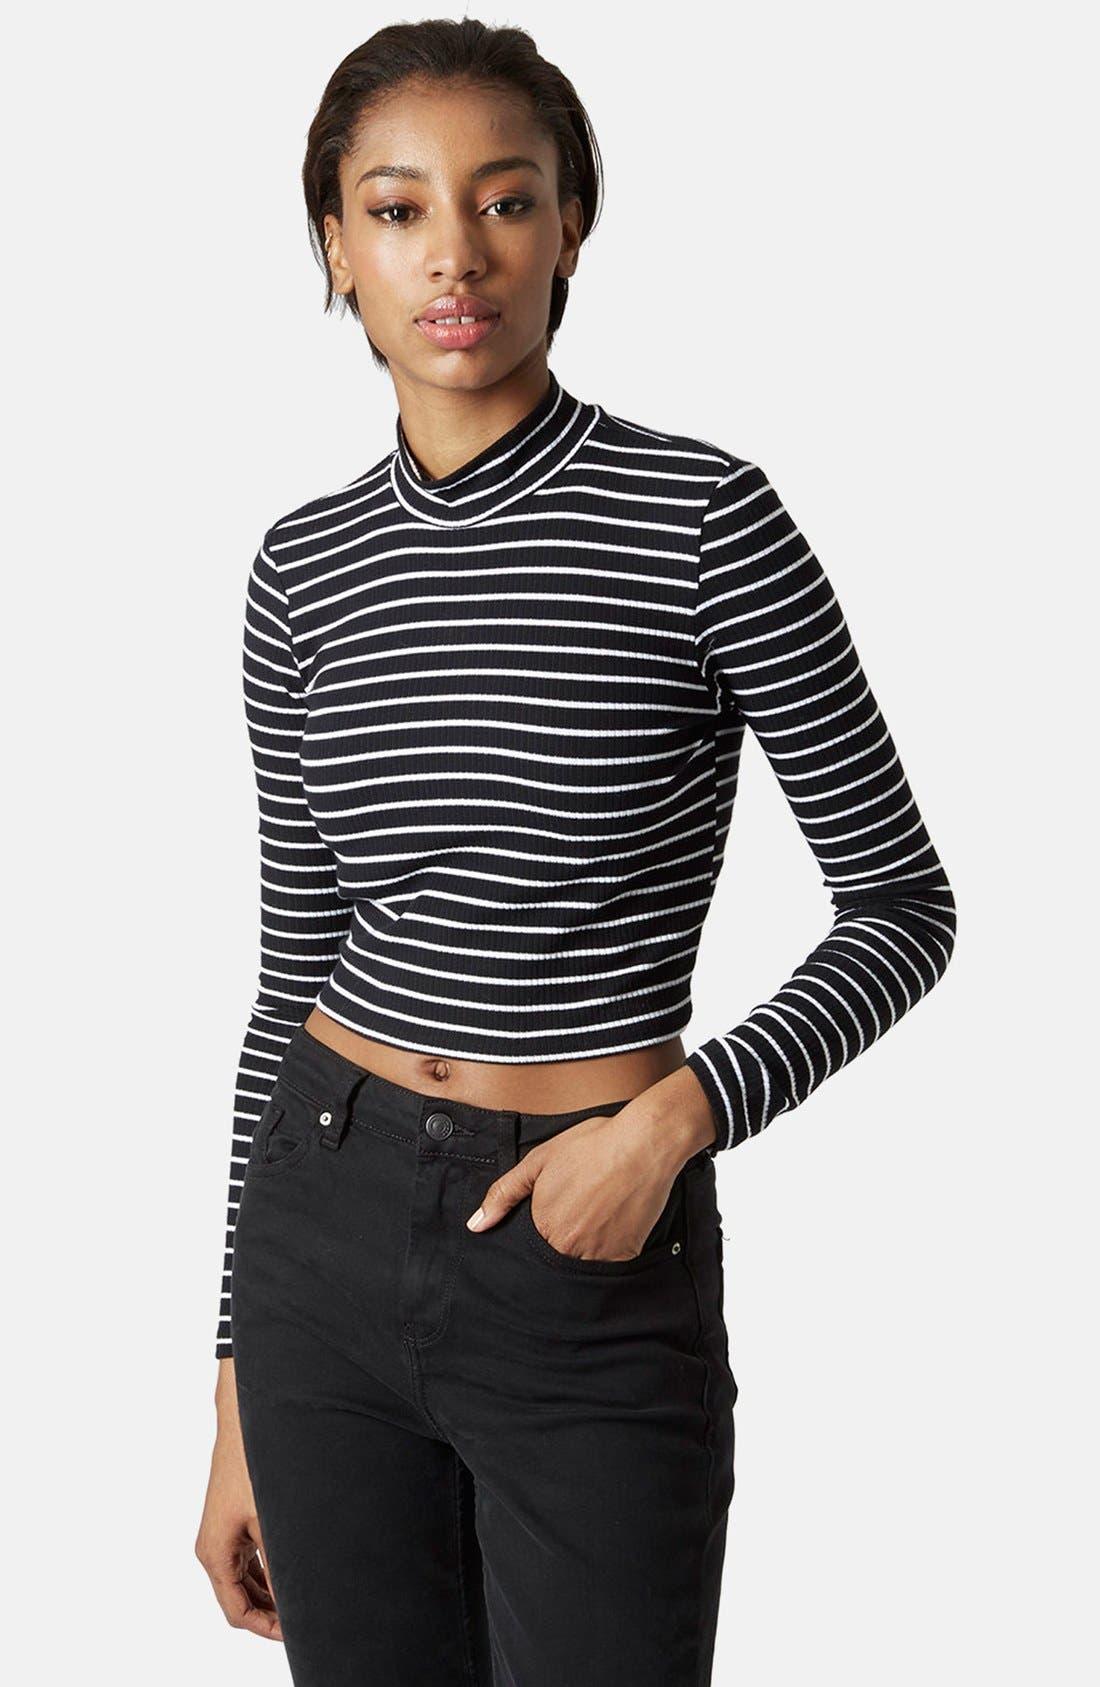 Alternate Image 1 Selected - Topshop Long Sleeve Rib Knit Top